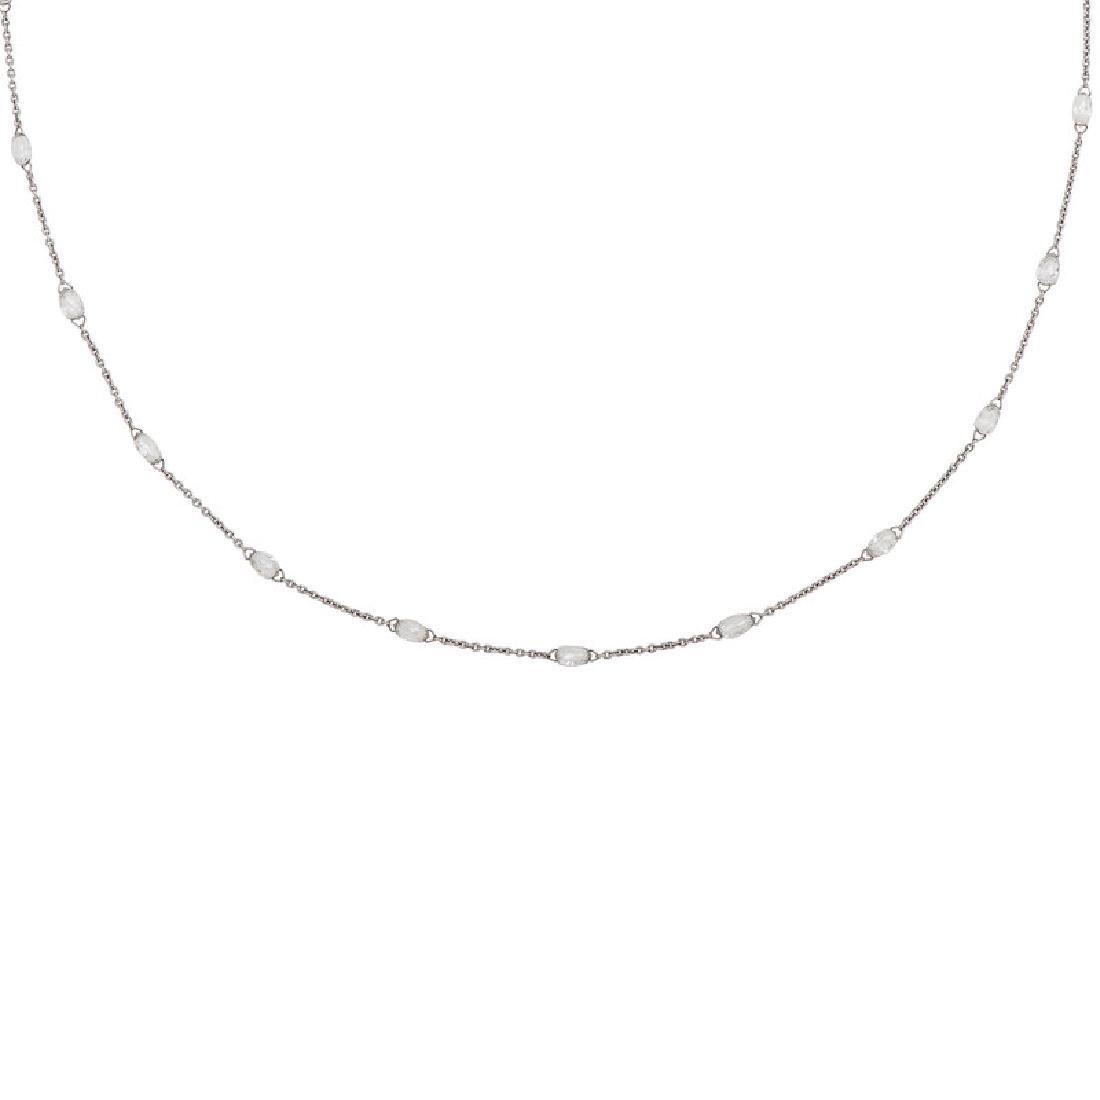 18 Karat White Gold Diamond Necklace